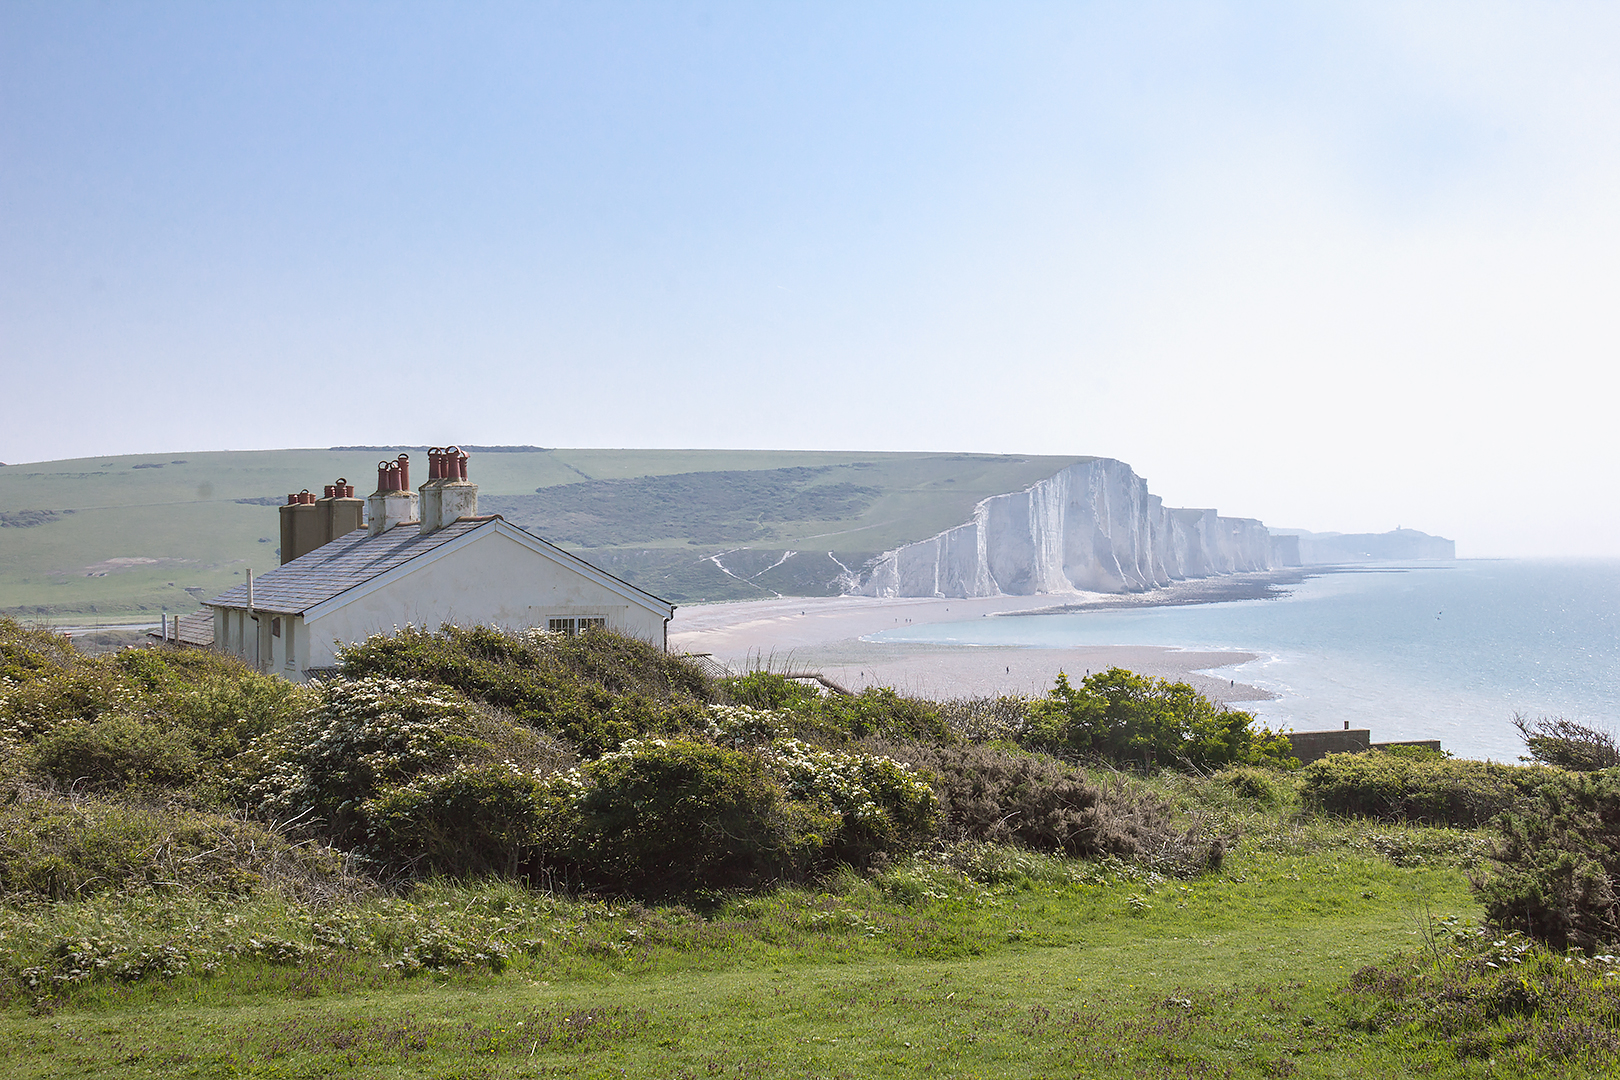 The coastguard cottages, seven sisters walk